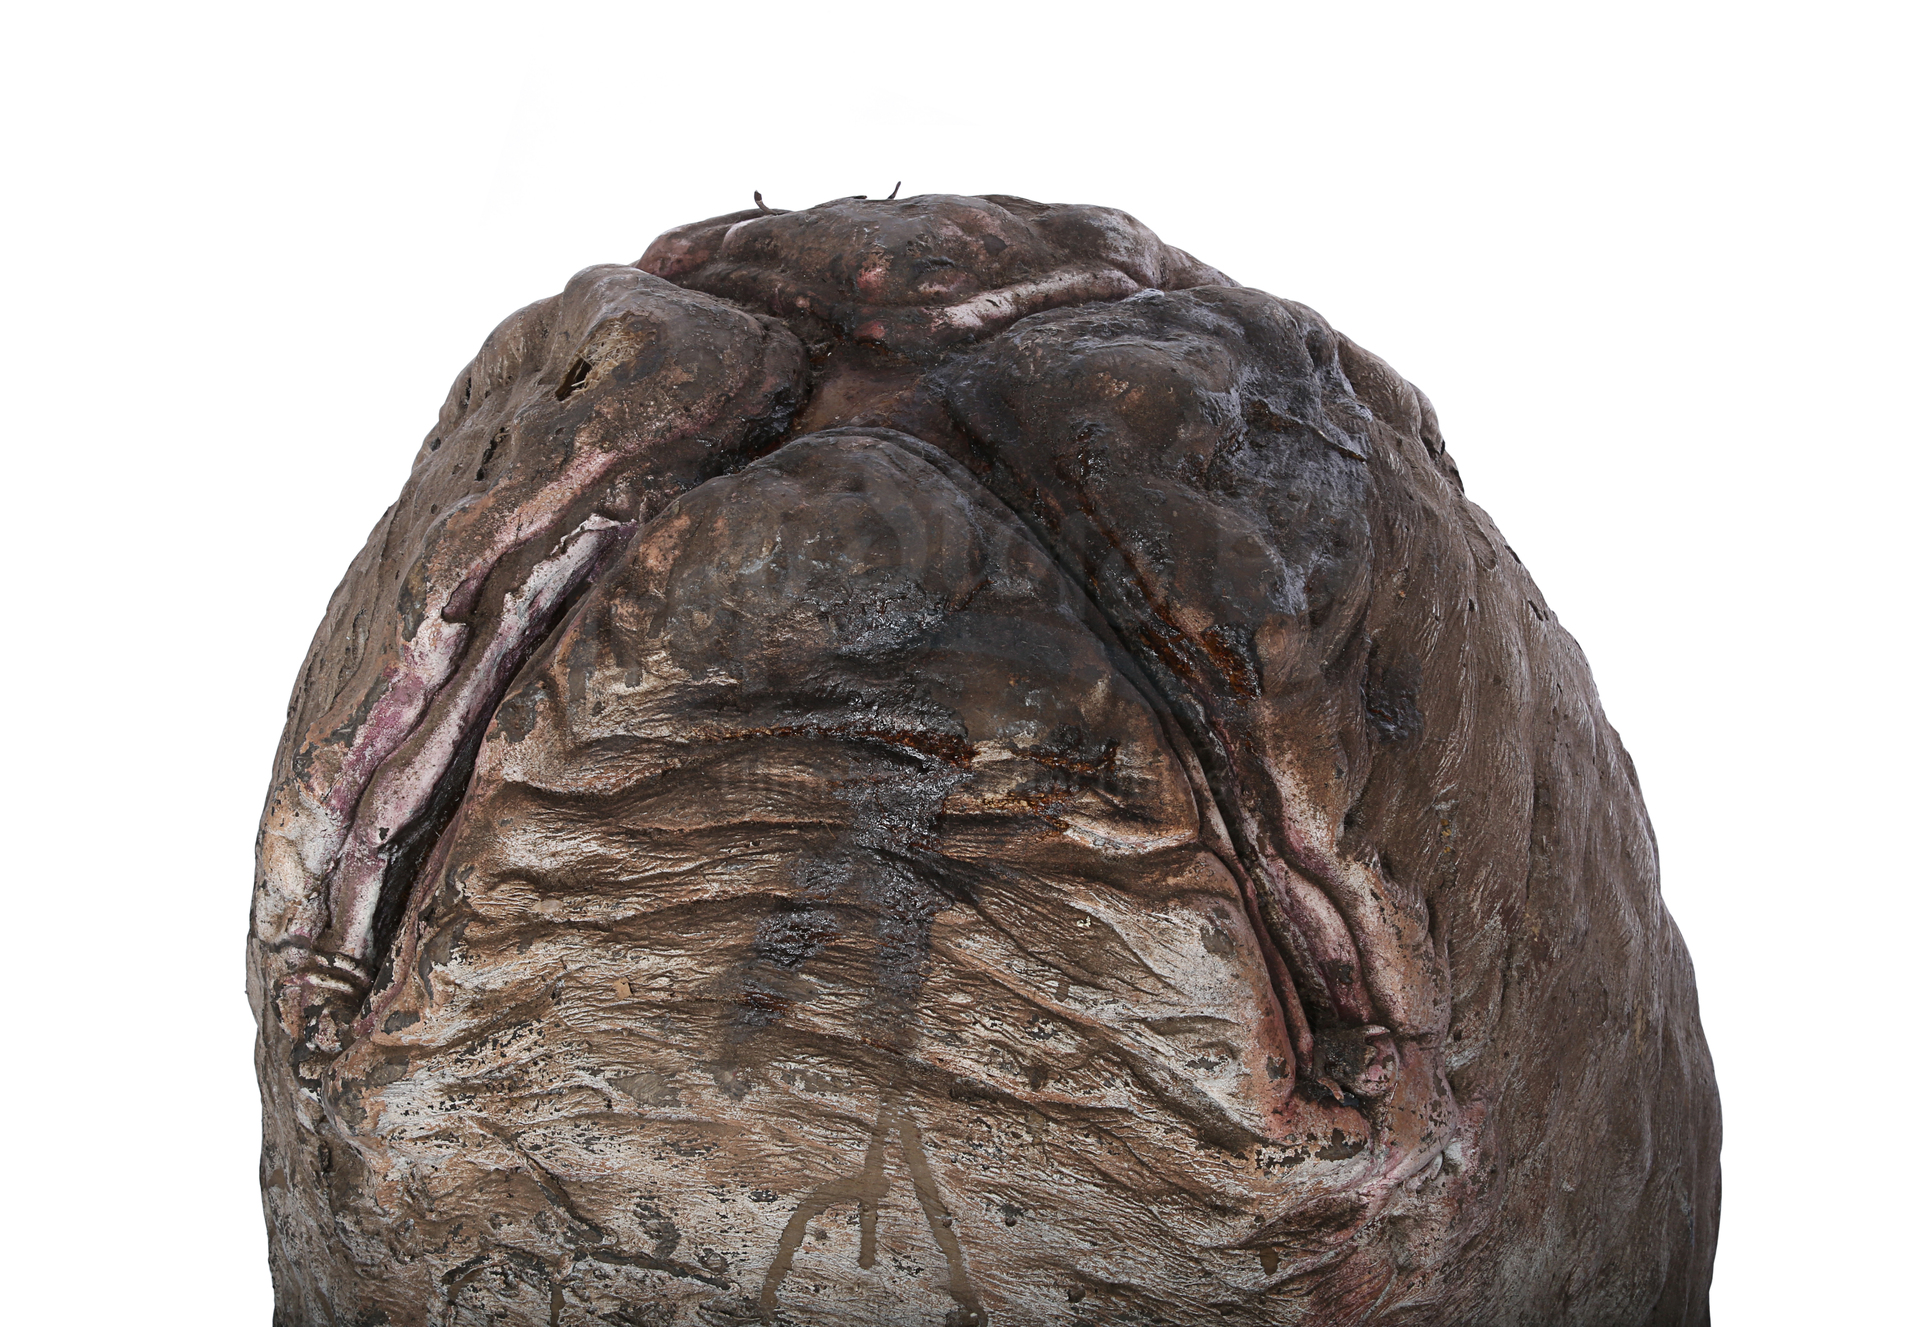 ALIENS (1986) - Xenomorph Egg - Image 7 of 14